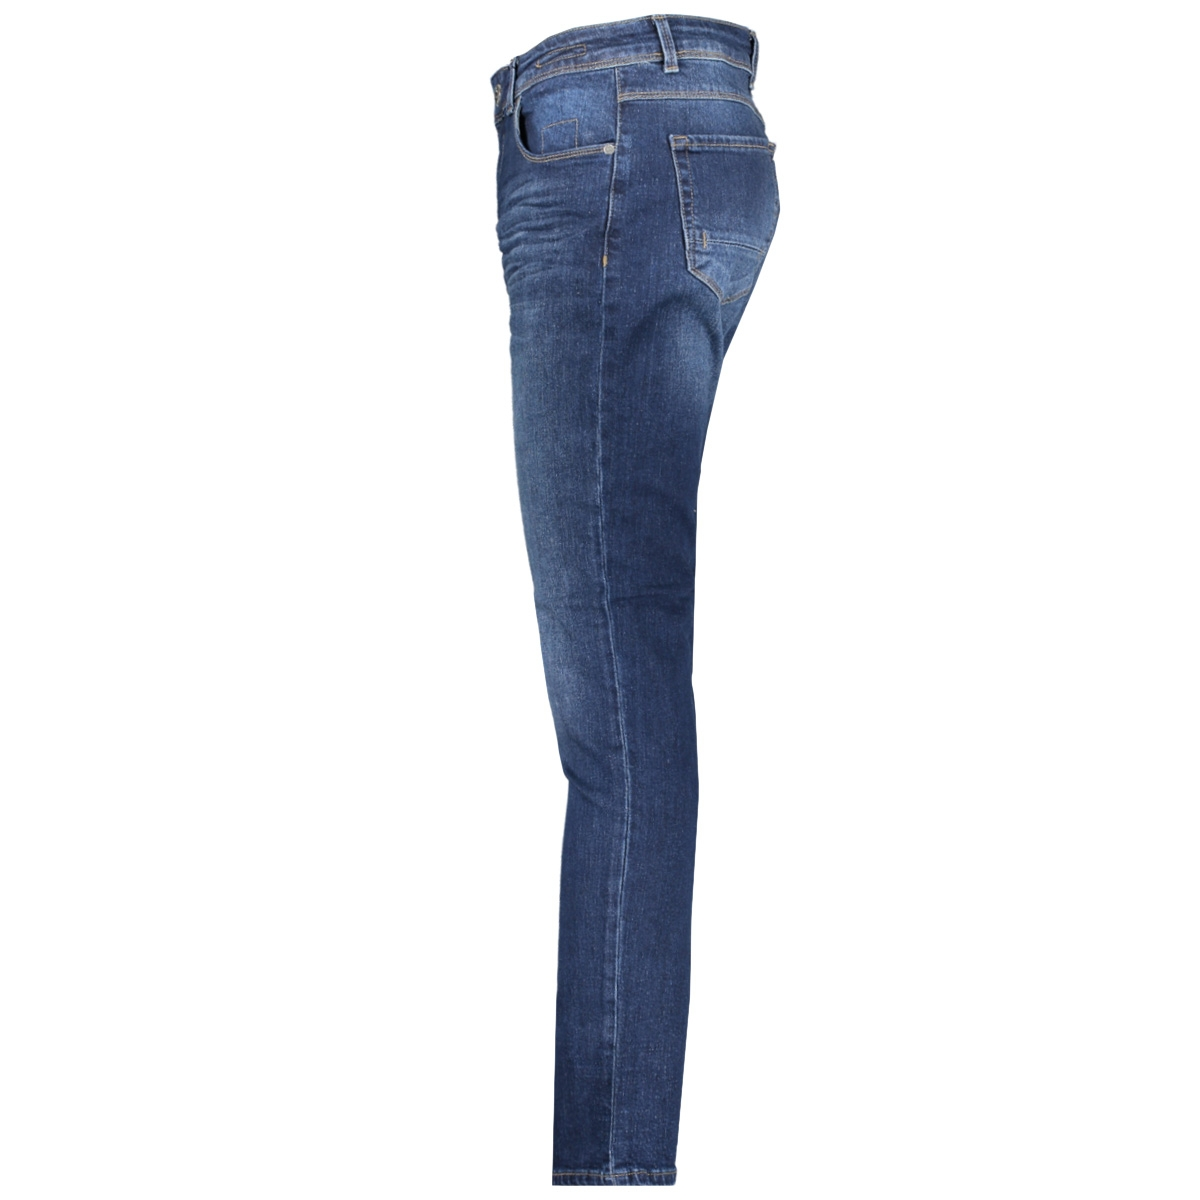 82632 gabbiano jeans blue stone